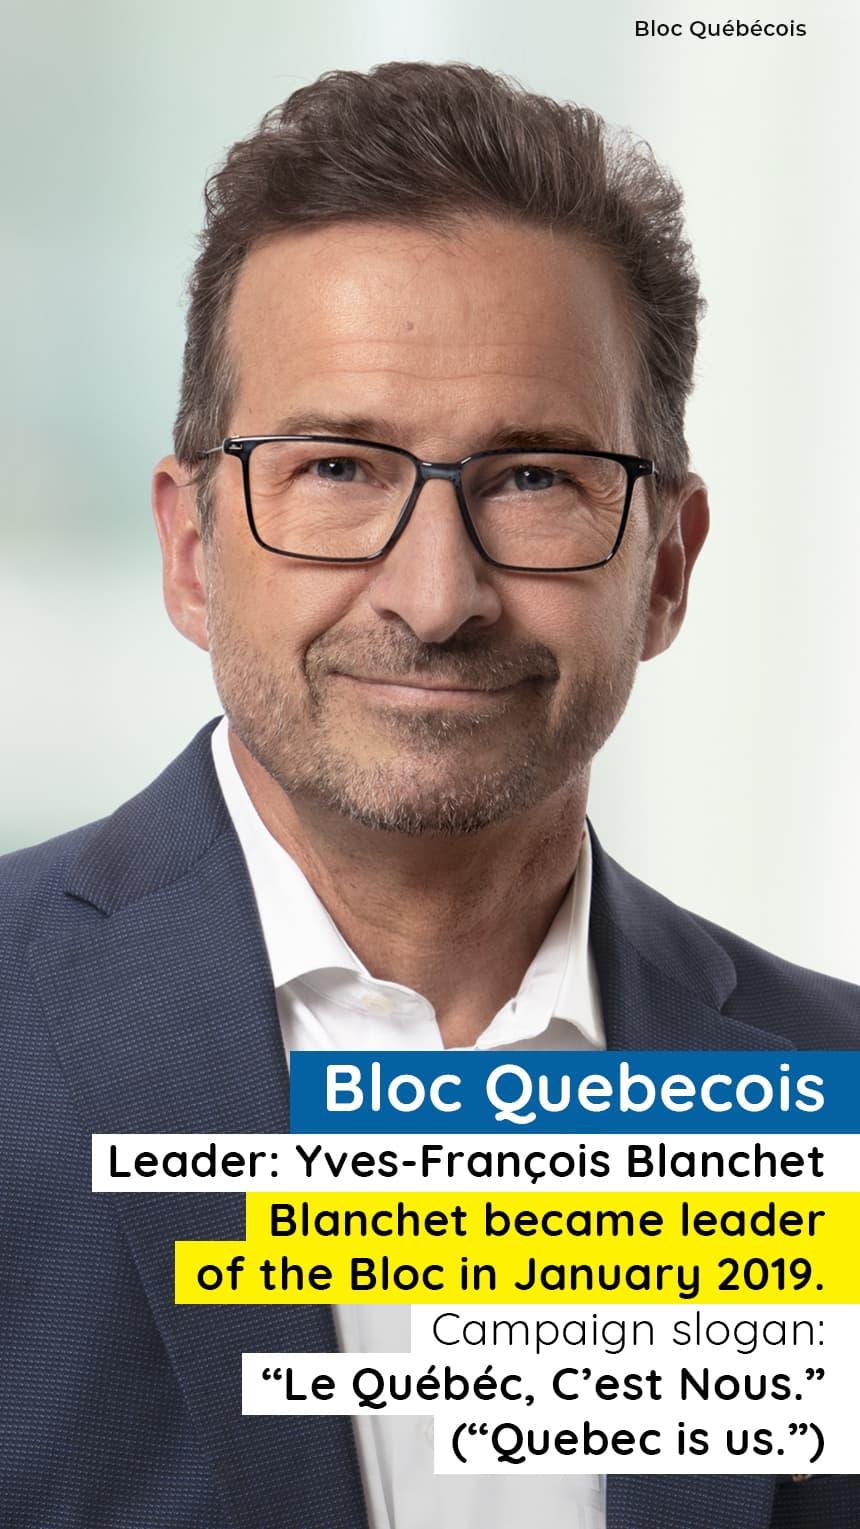 An image of Yves-François Blanchet with text that says, Bloc Québécois - Party leader Yves-François Blanchet. Blanchet became leader of the Bloc in January 2019. Campaign slogan: Le Québéc, C'est Nous (Quebec is us)